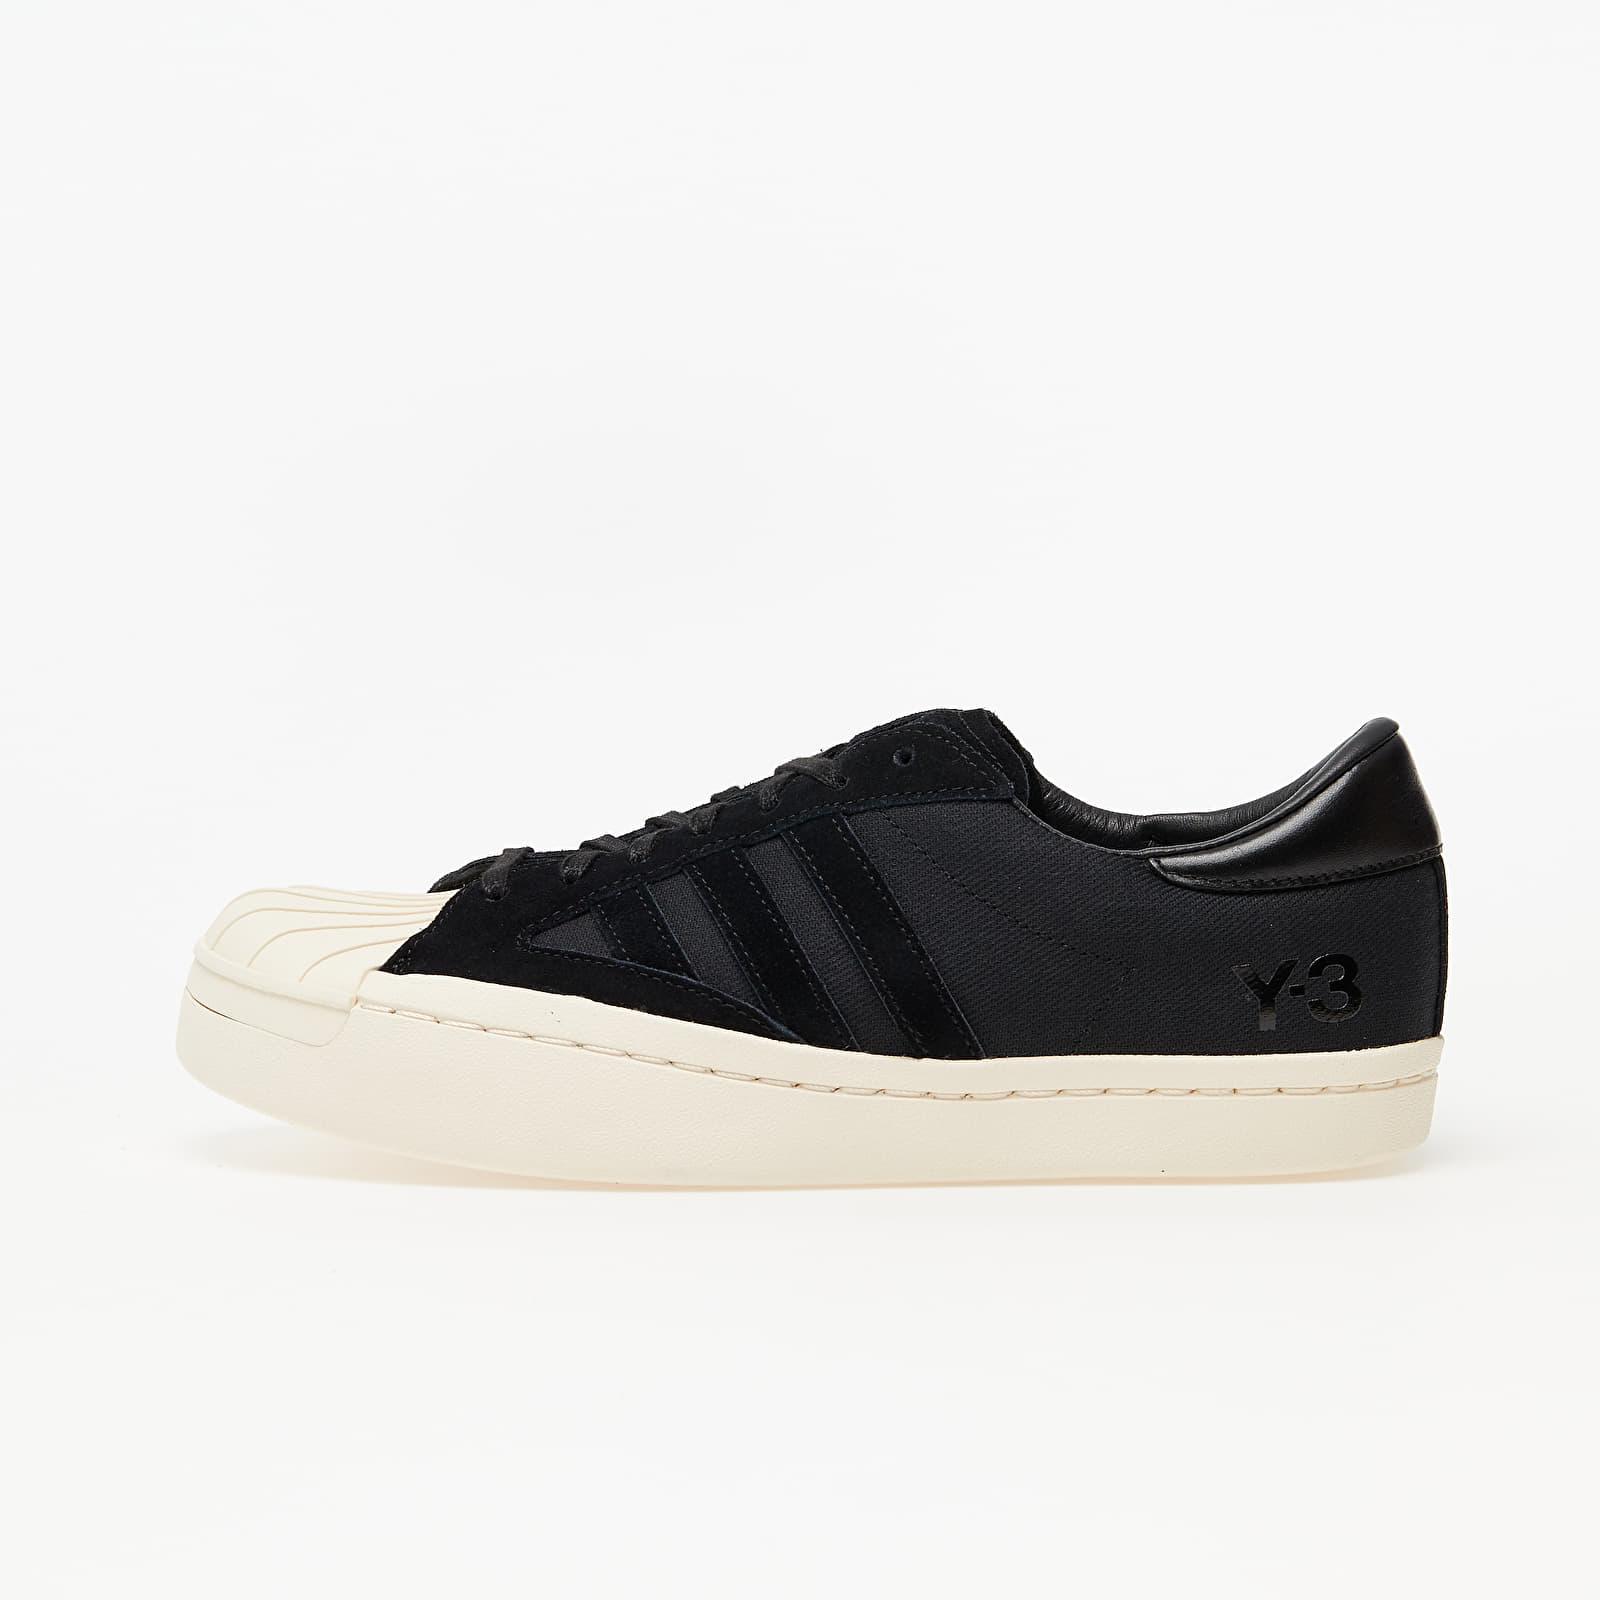 Chaussures et baskets homme Y-3 Yohji Star Black/ Black/ Black